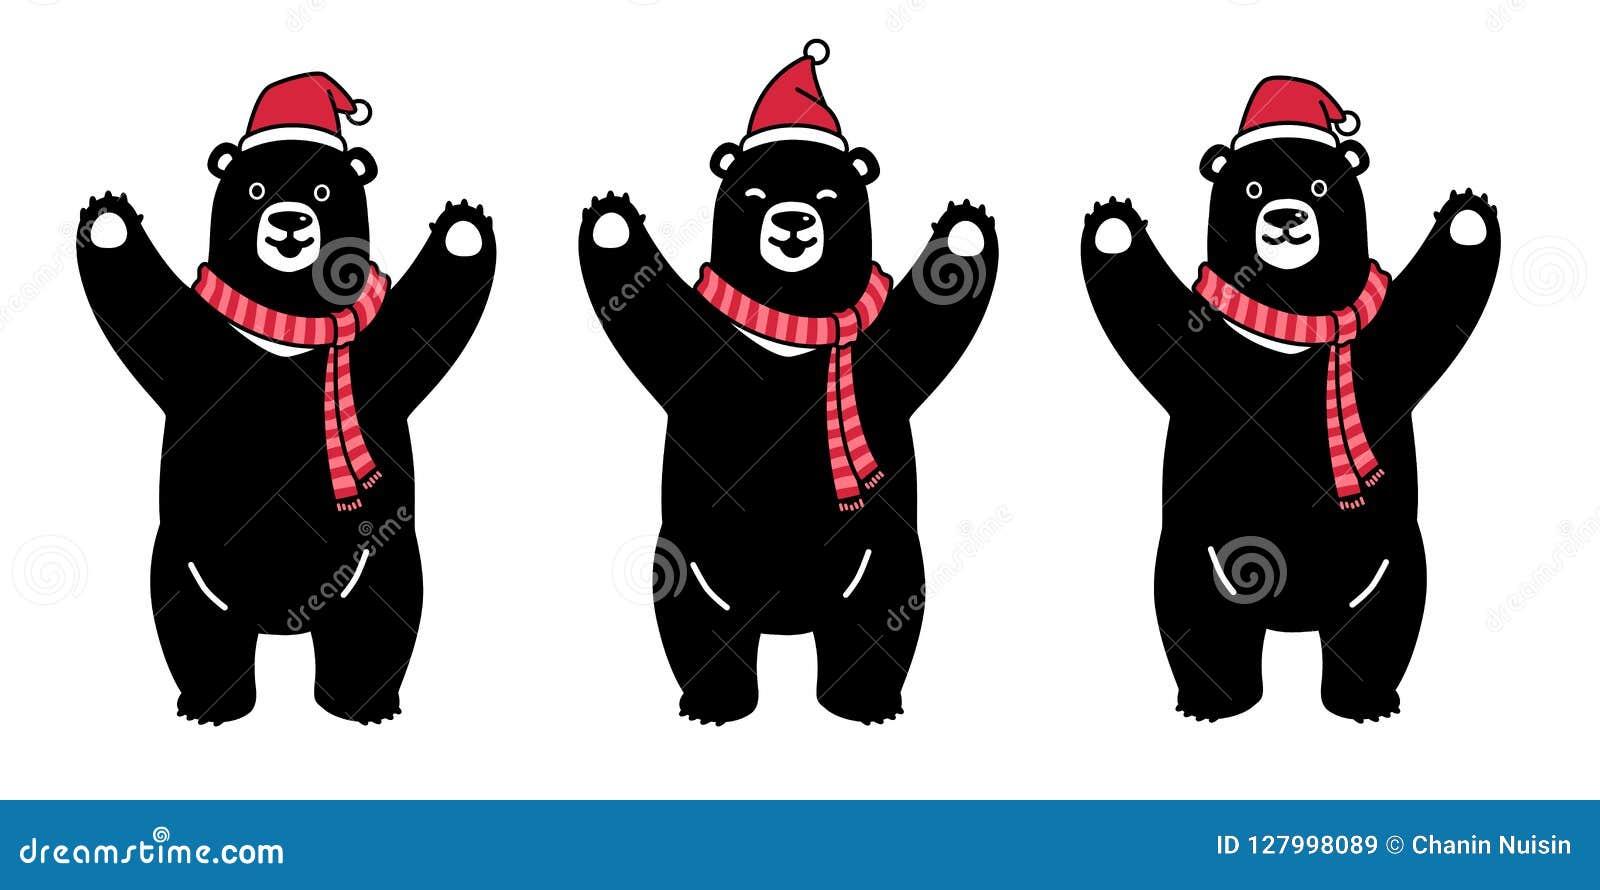 Bear vector polar bear Christmas Santa Claus Xmas scarf cartoon character icon logo illustration symbol graphic black